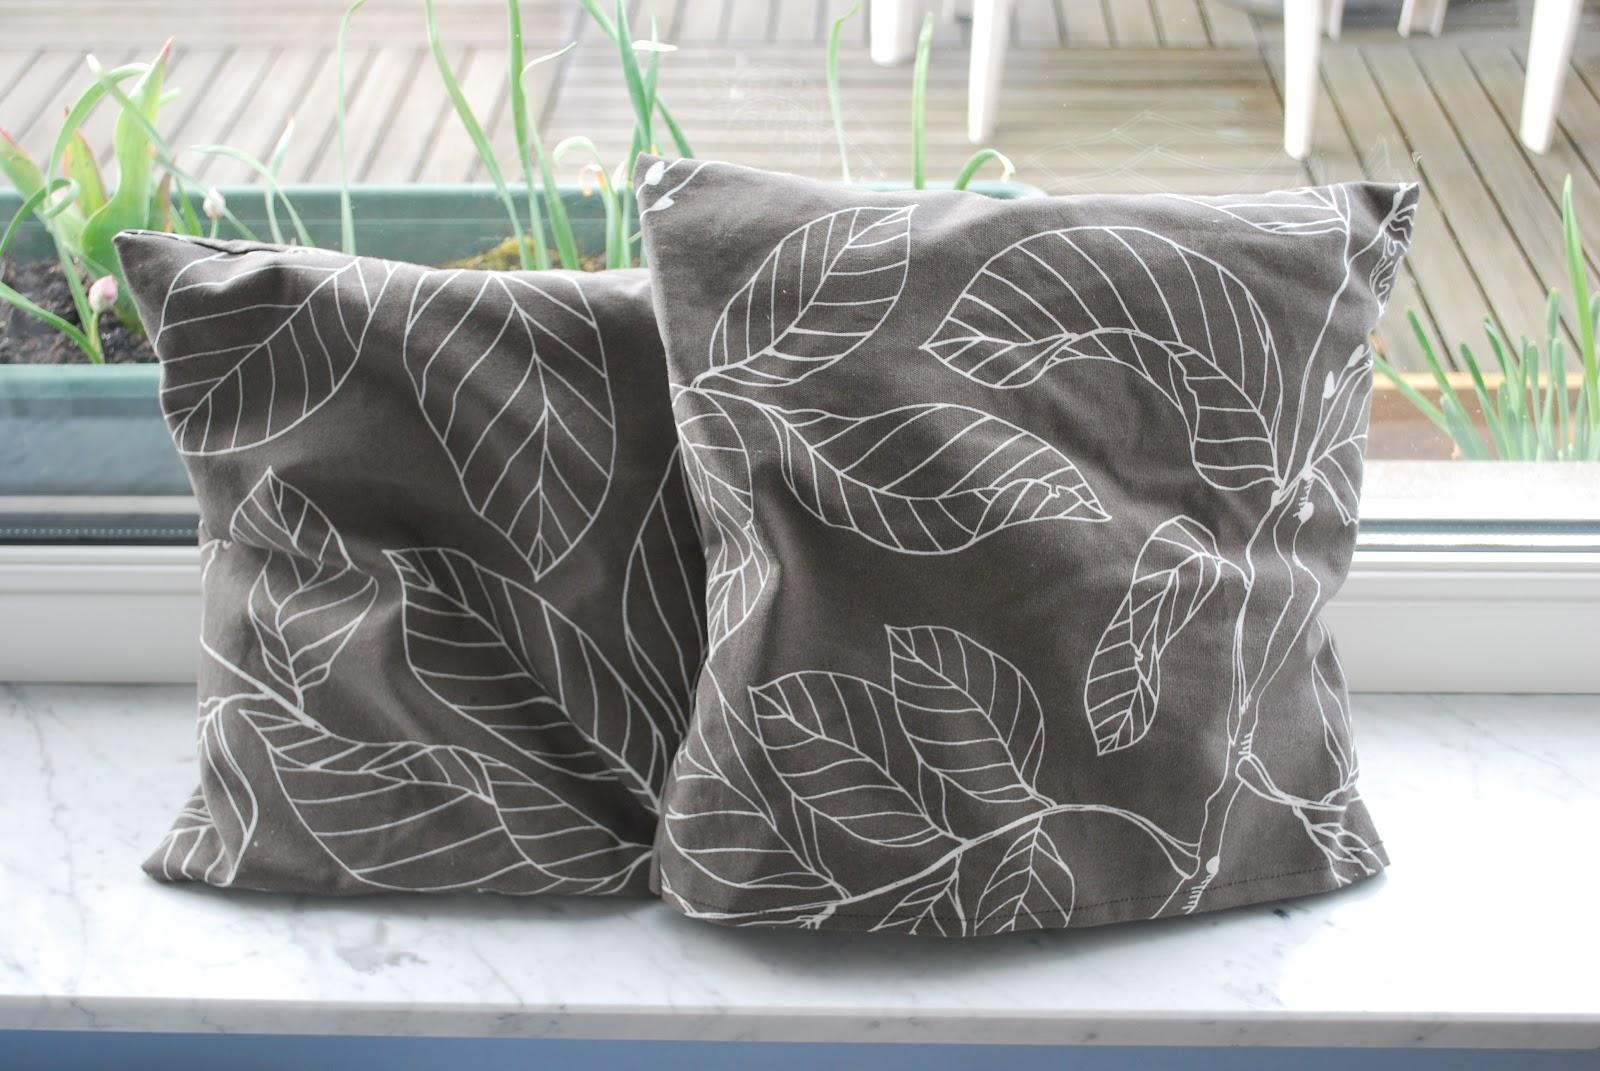 Ikea kussens paars images henrika kussenovertrek ikea